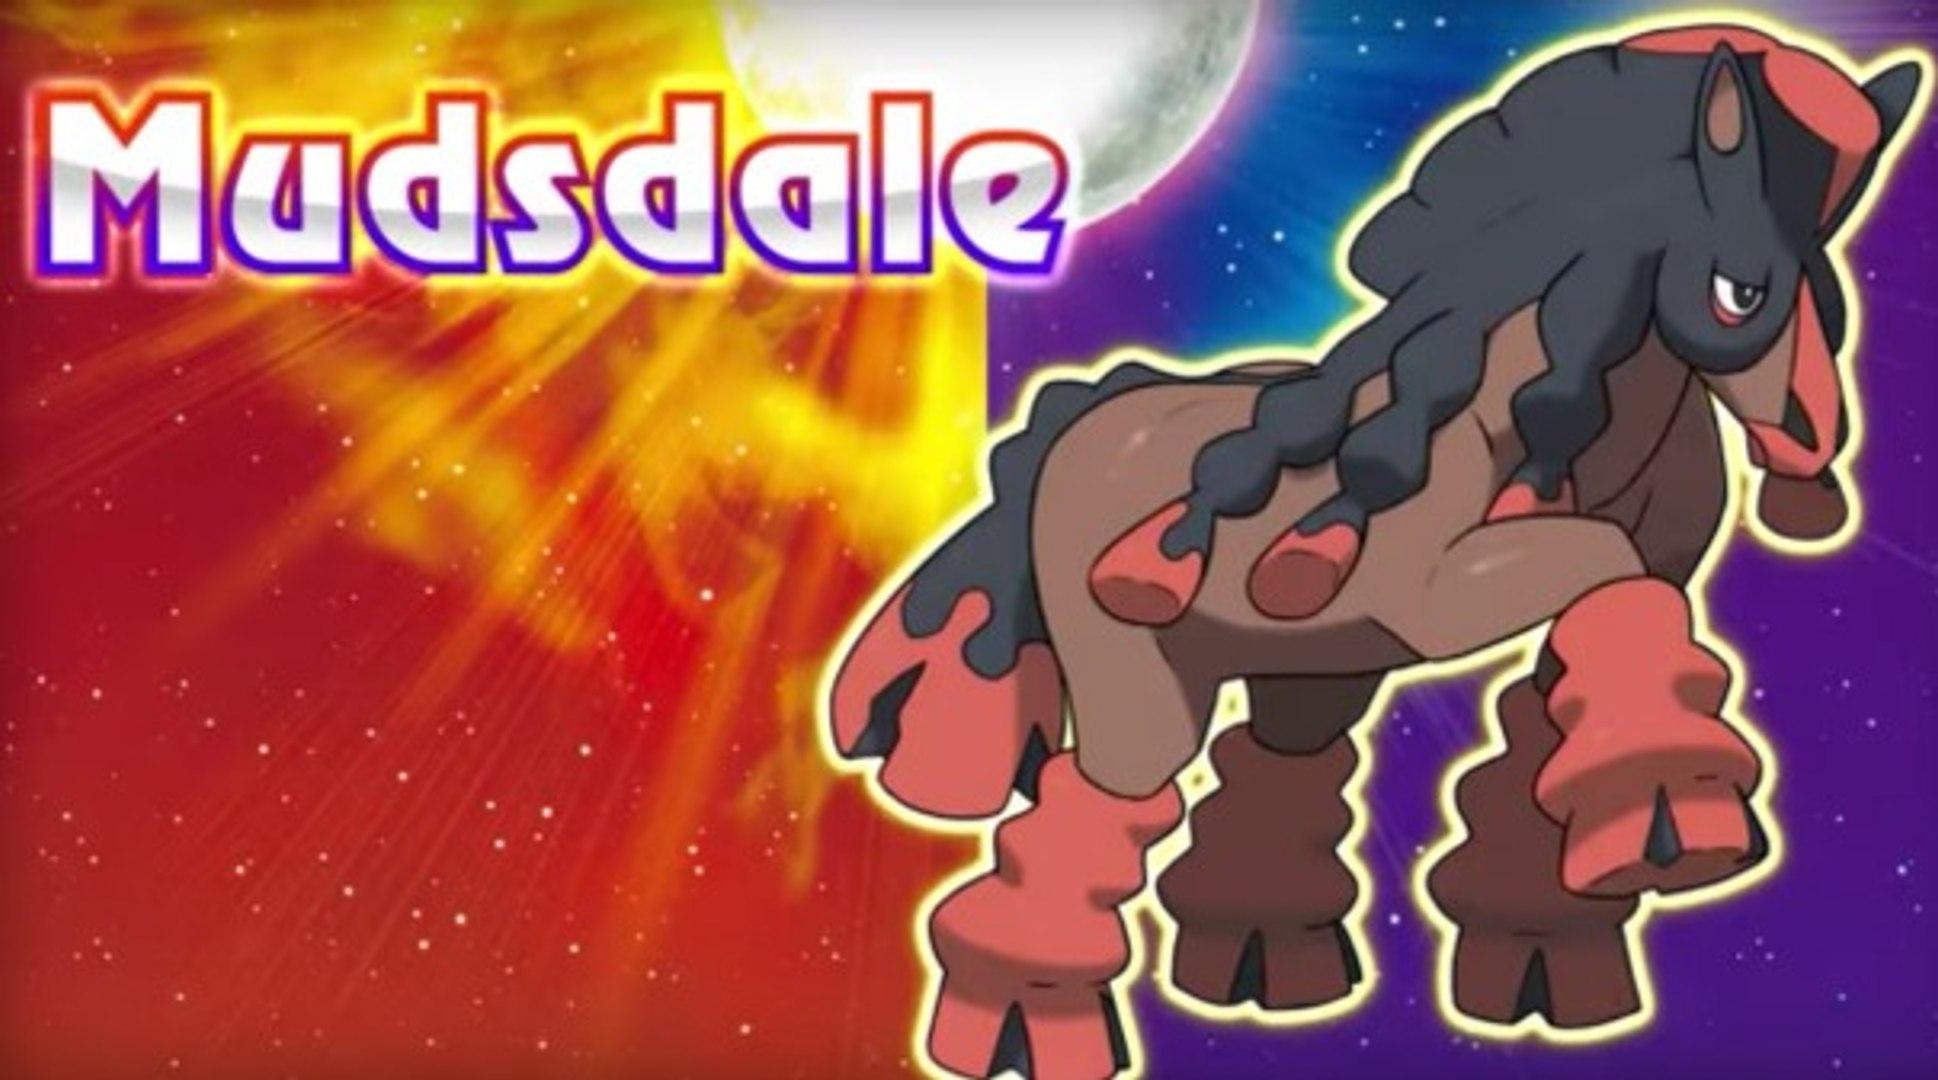 ¡Se han descubierto nuevos Pokémon para Pokémon Sol y Pokémon Luna!